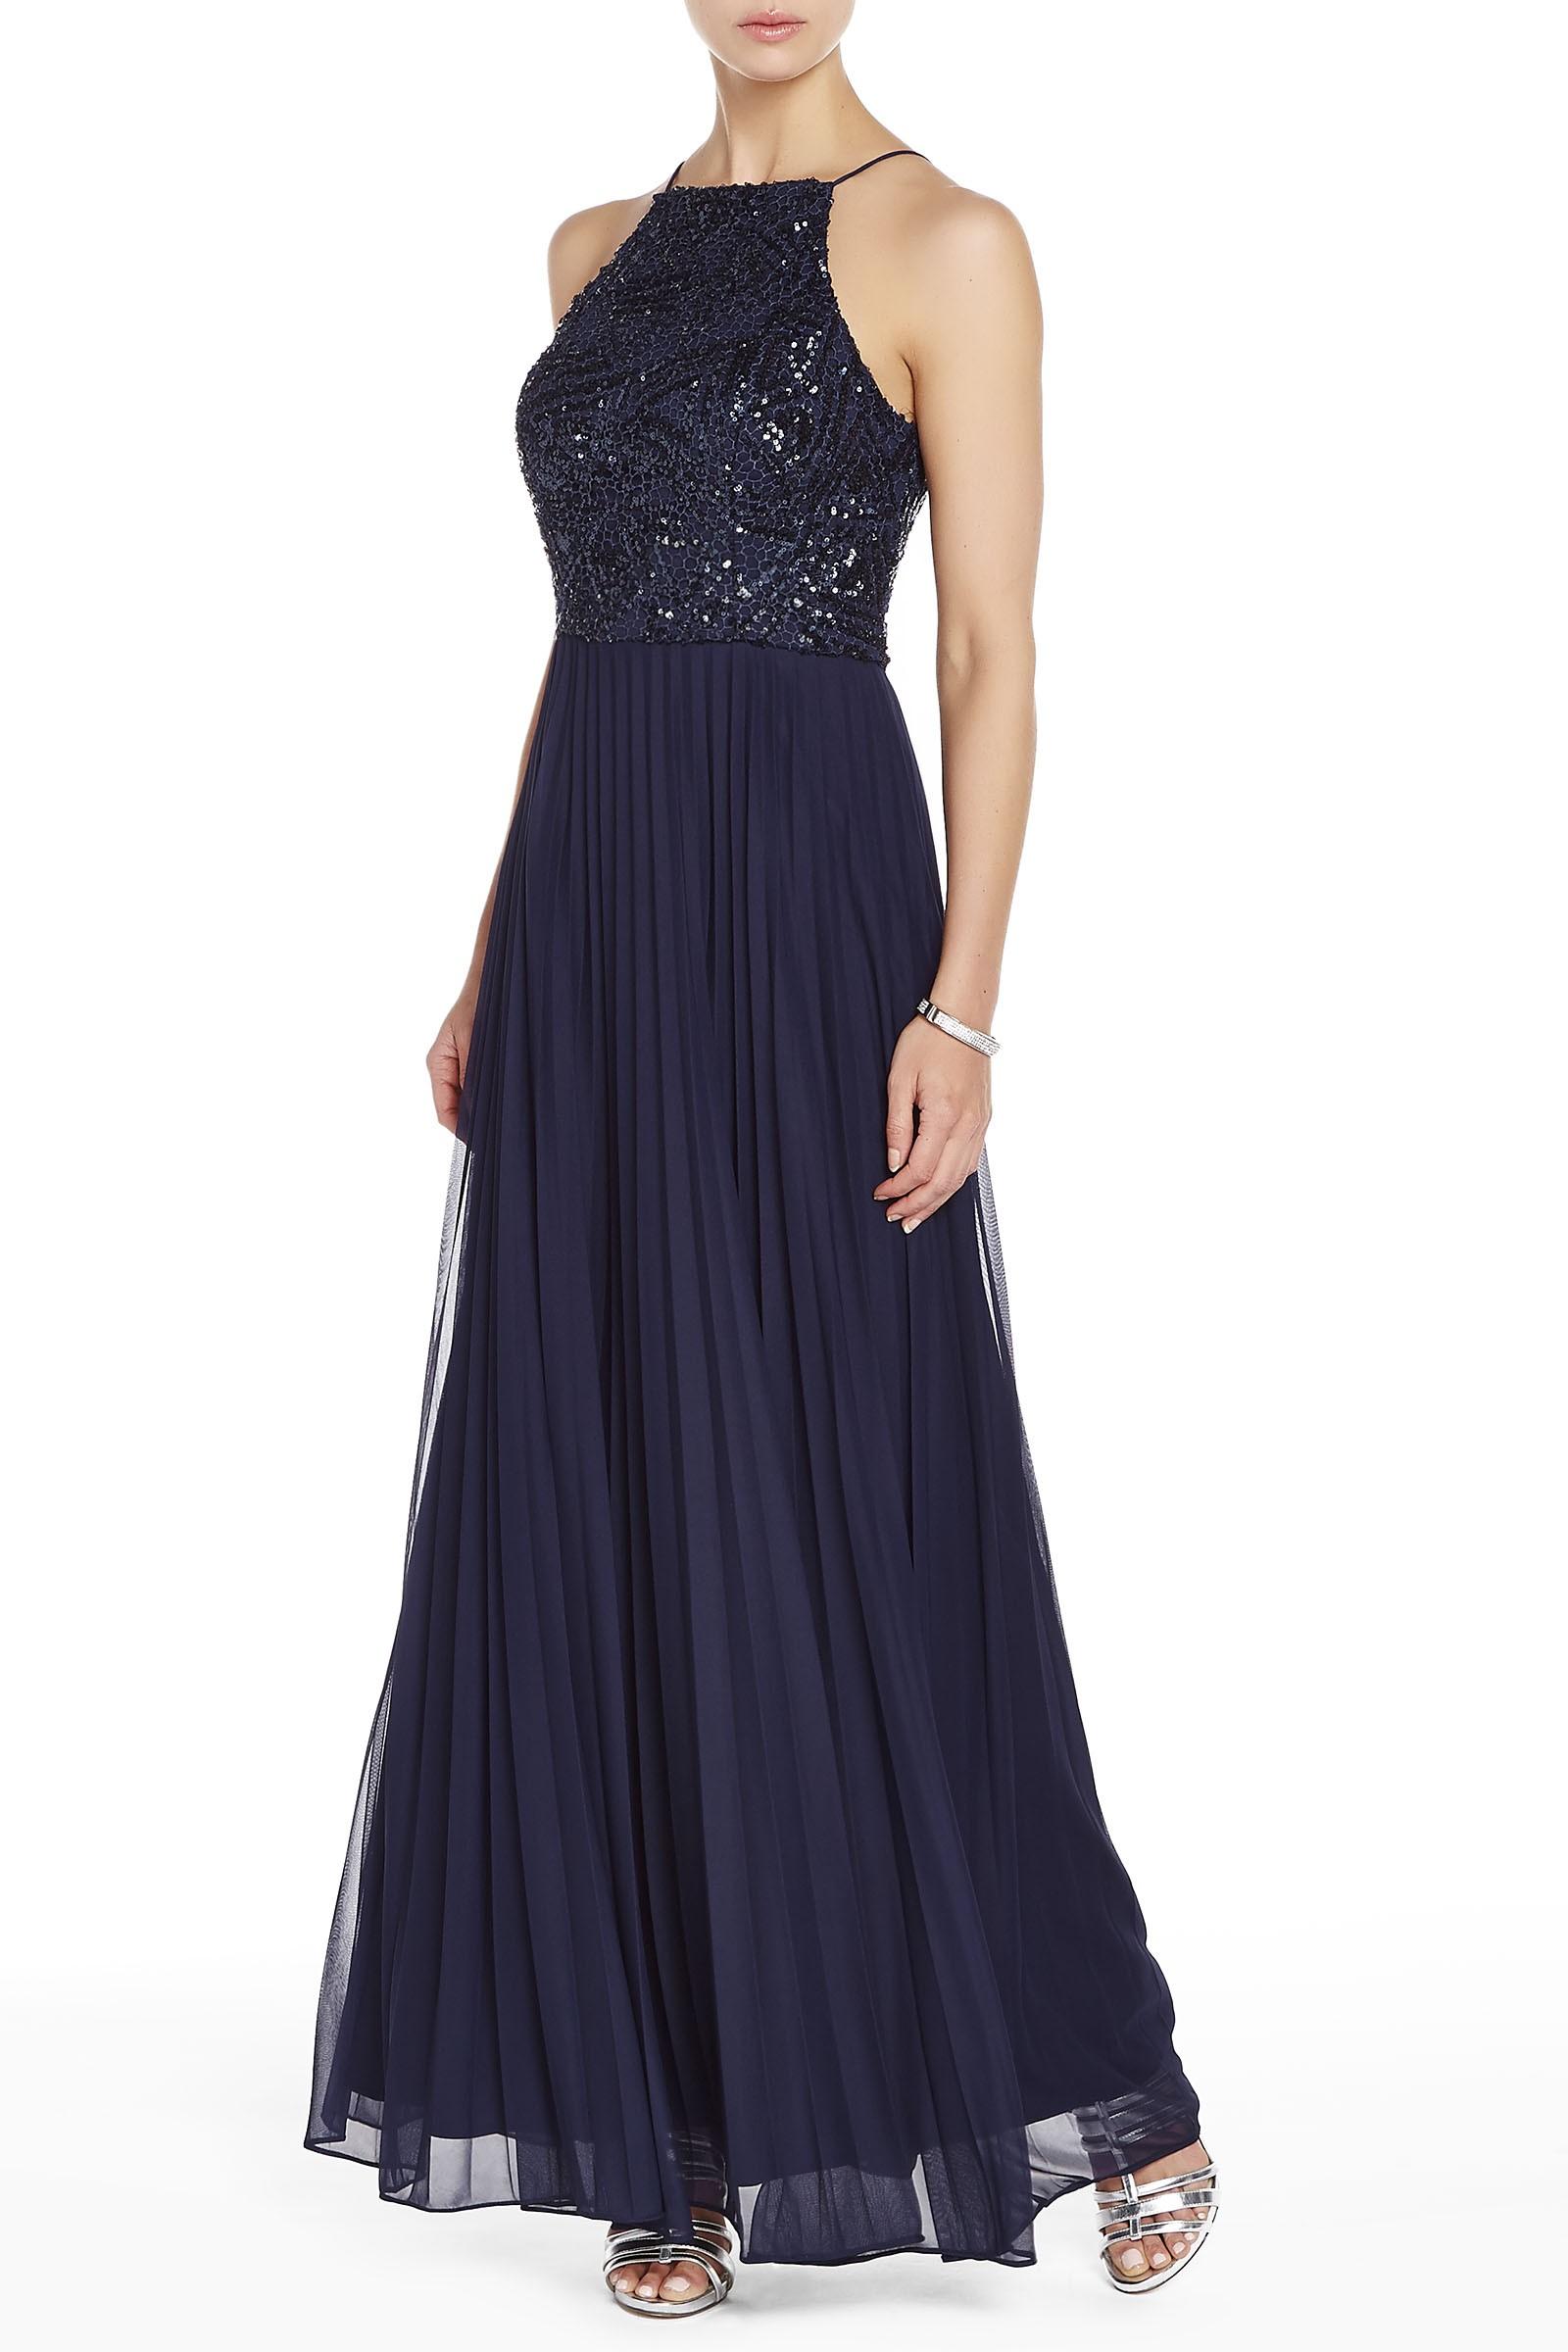 566647d0ac Melanie Lyne Women's Cachet Beaded Halter Top Gown - Navy - Size: 4 ...